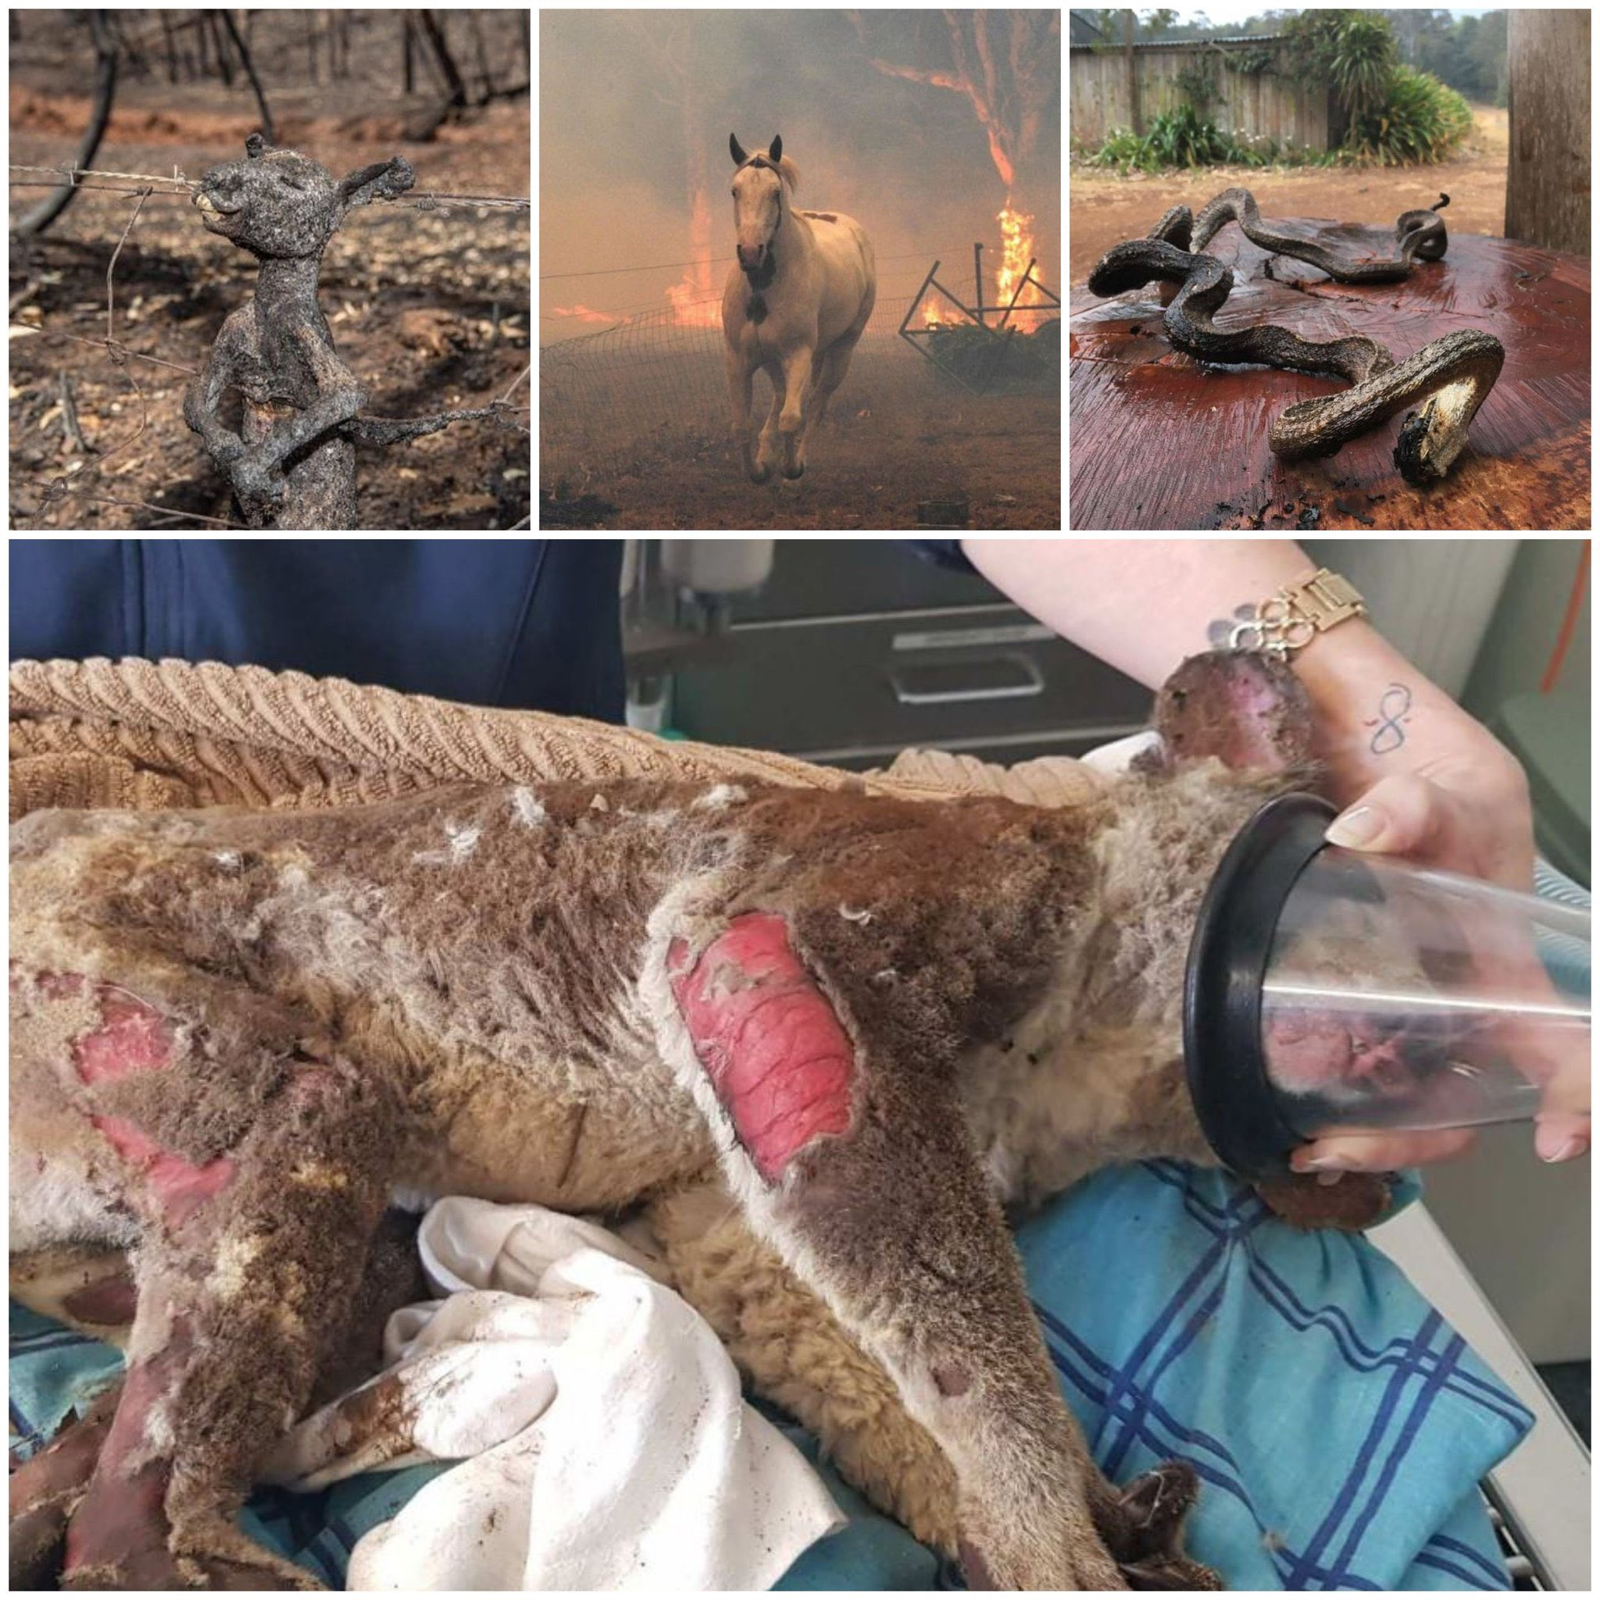 Forest Fire Jihad in Australia. Over 500 million animals killed.